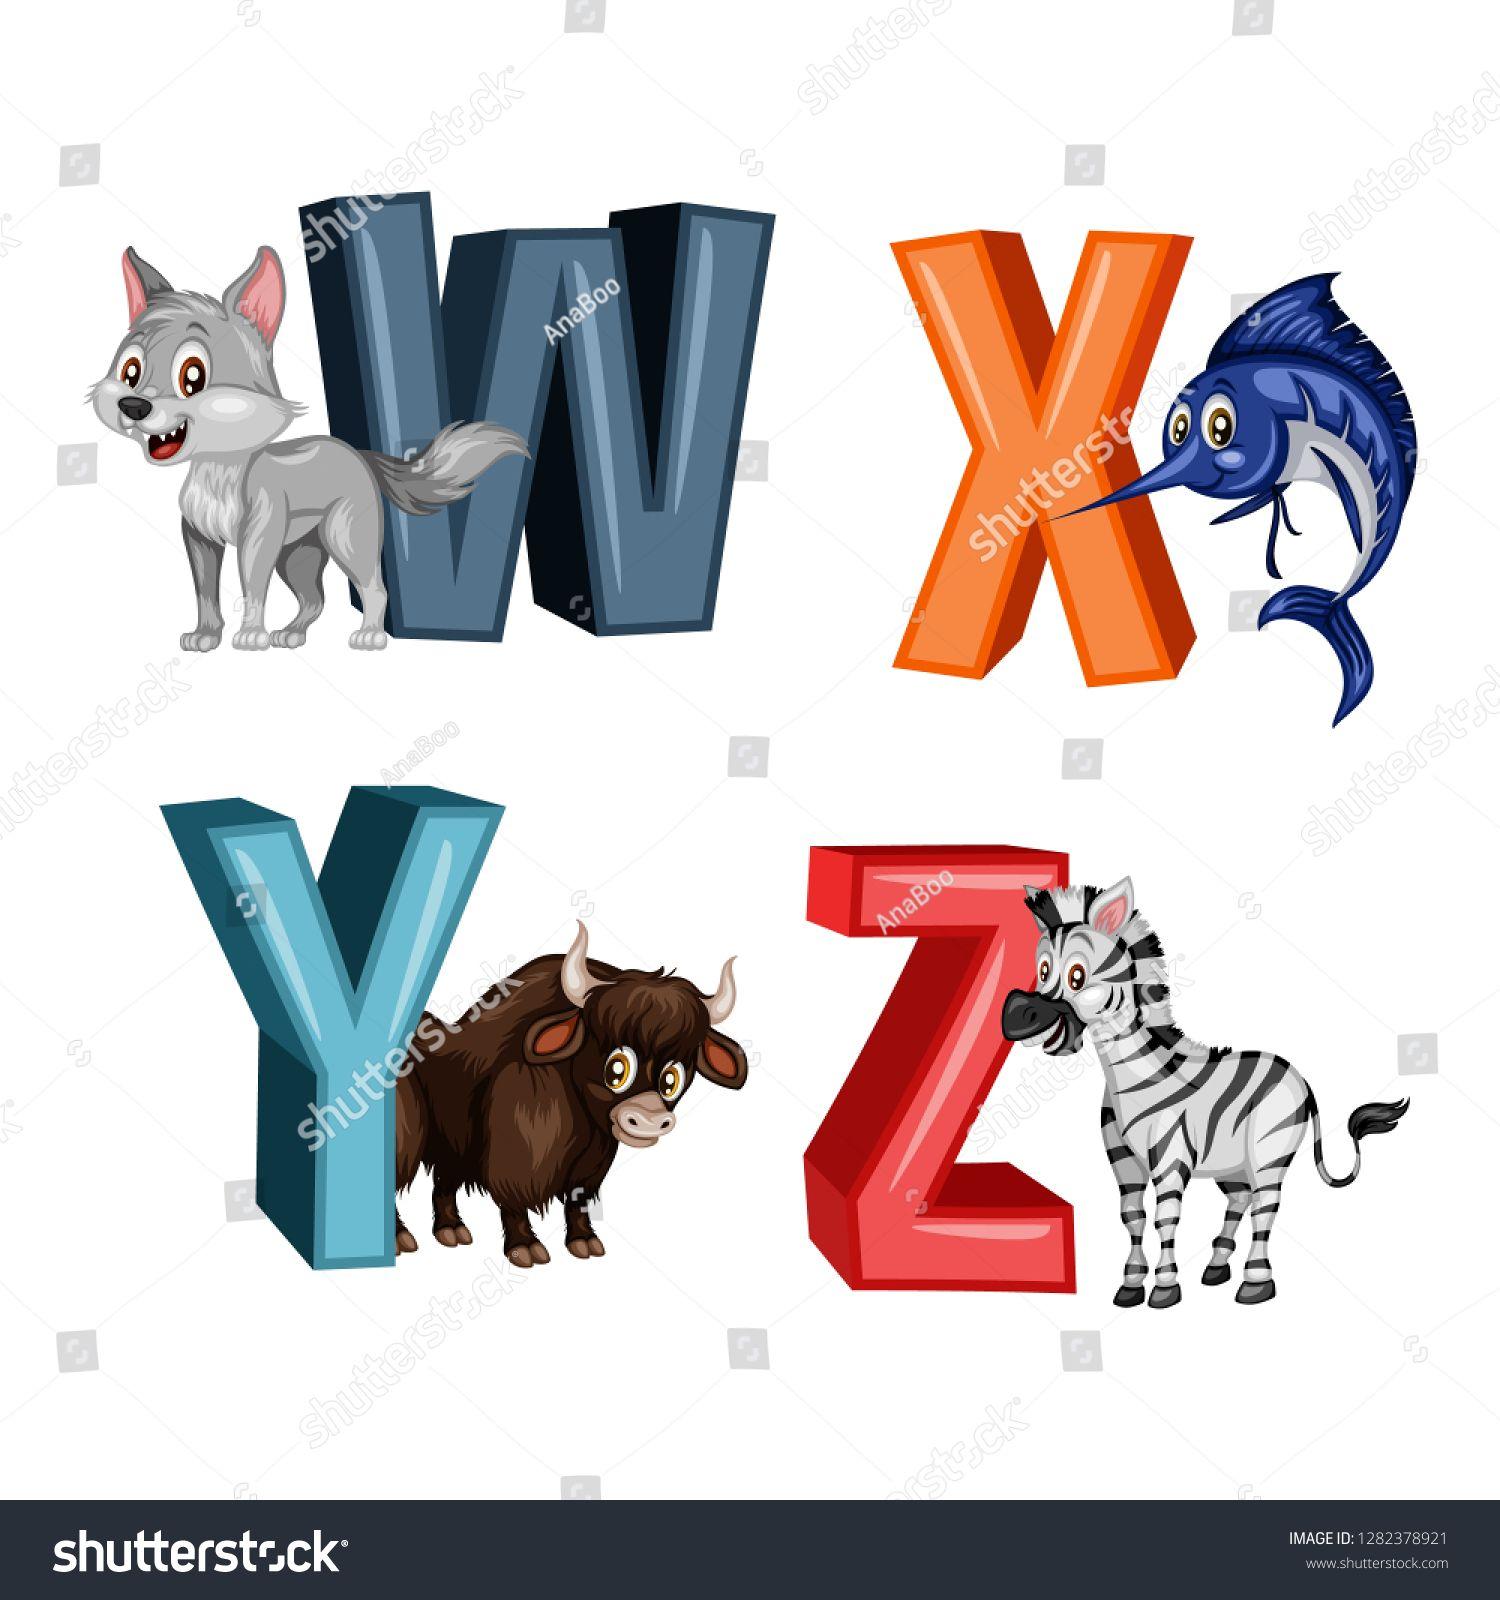 Animal Alphabet Vector Illustration Of Happy Wolf Xiphias Yak Zebra Letters W X Y Z Cute Cartoon Cute Cartoon Animals Animal Alphabet Cartoon Animals